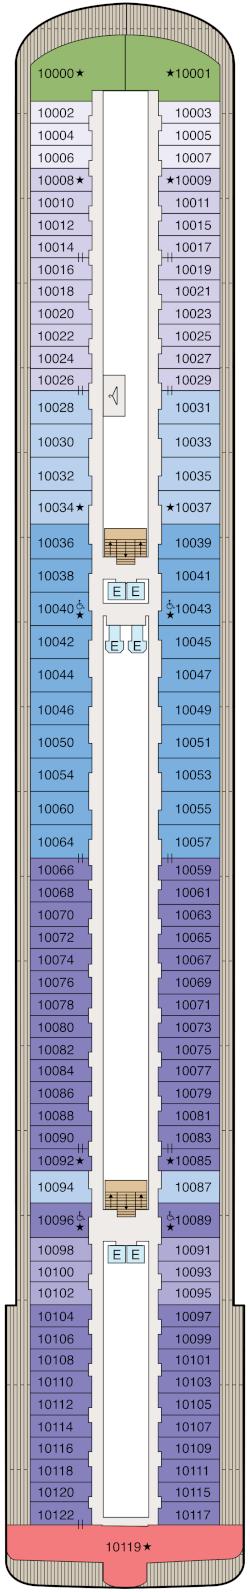 Vista Deck 10 Deck Plan